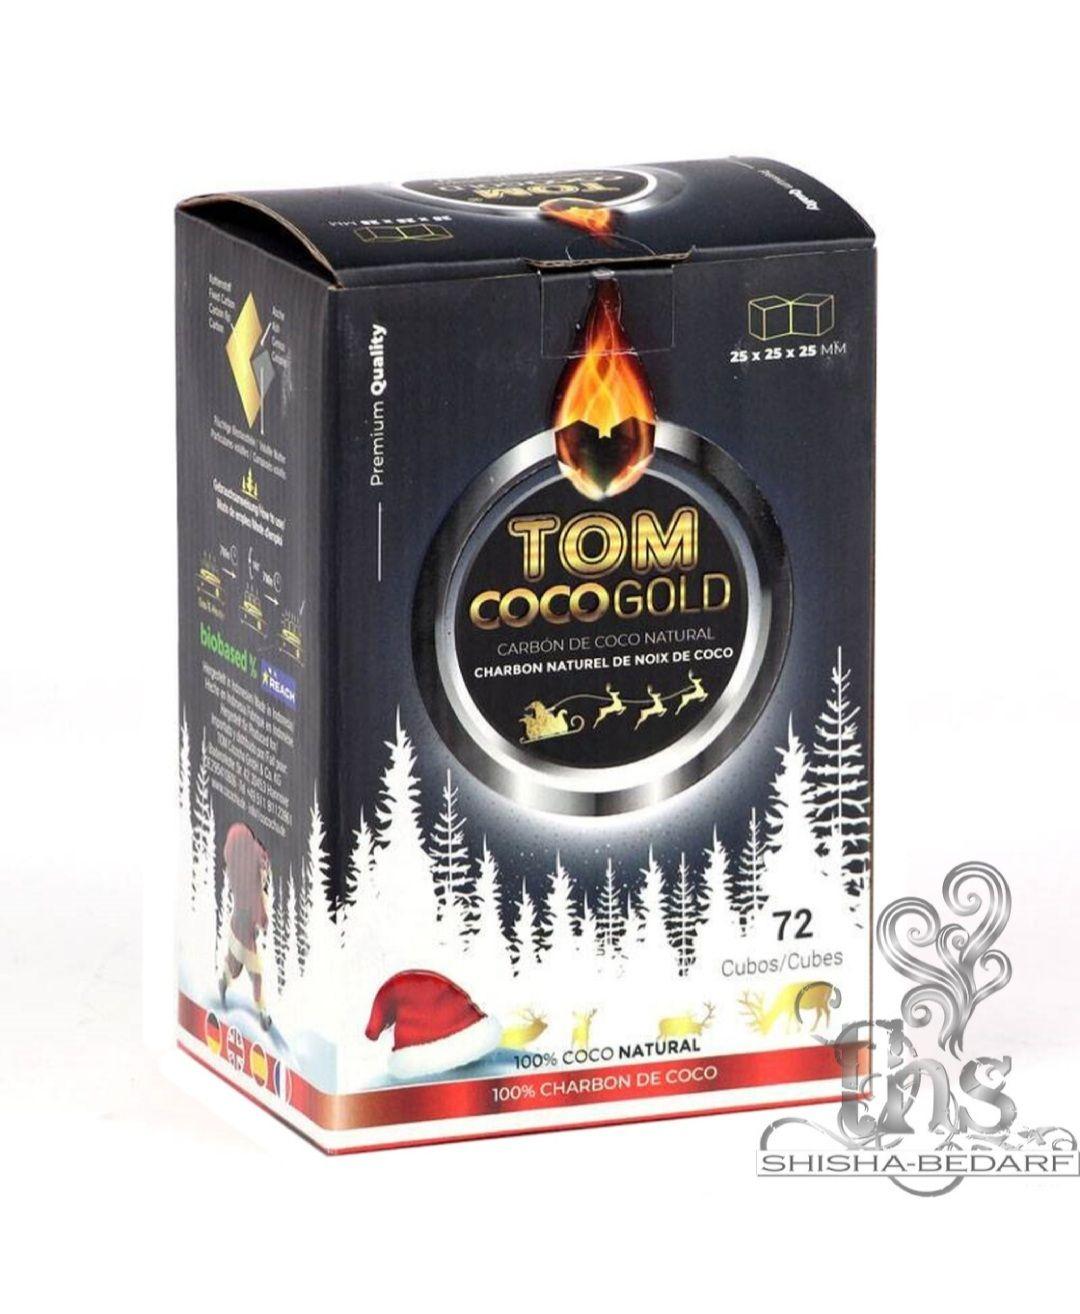 Tom Cococha Gold C25 - 1Kg Shisha / Grill Kohle Weihnachtsedition 1,69€ (Inklusive Rubellos)